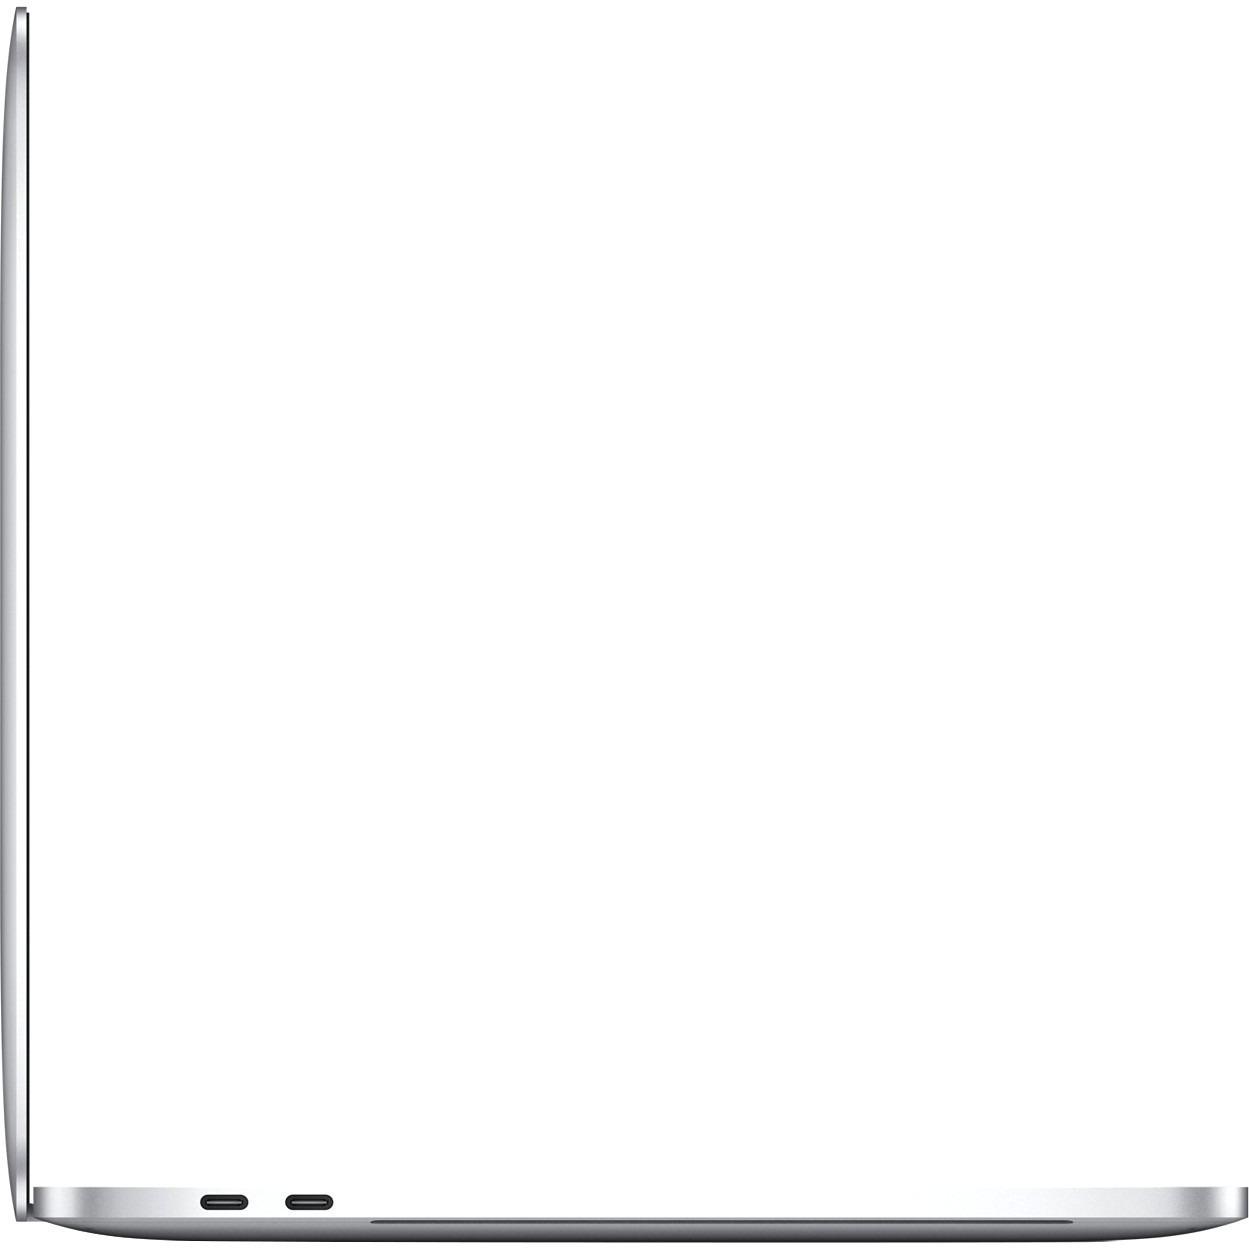 Apple MacBook Pro MR962B/A 39.1 cm 15.4And#34; Notebook - 2880 x 1800 - Core i7 - 16 GB RAM - 256 GB SSD - Silver